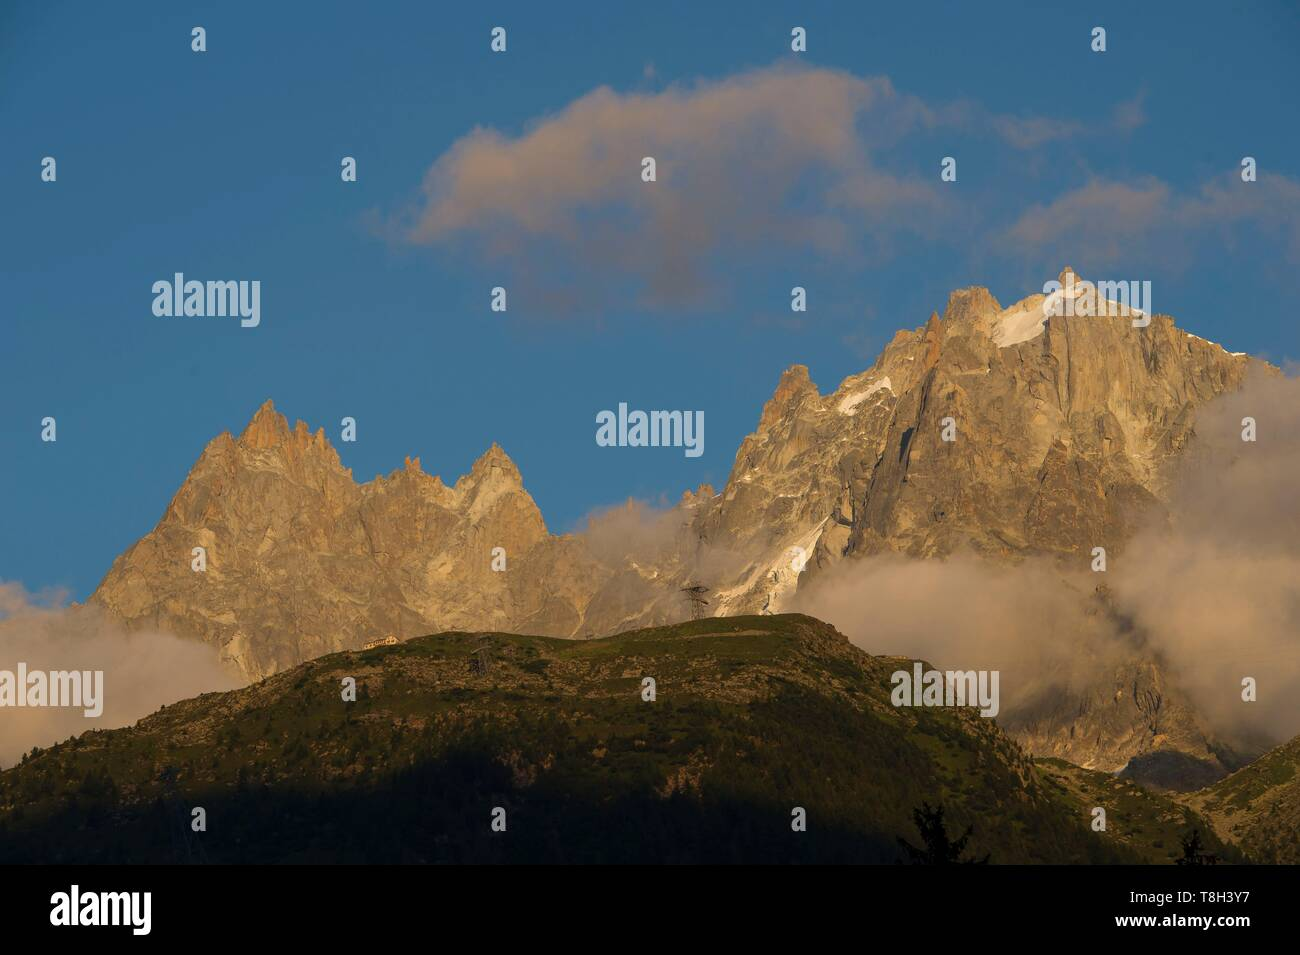 Ciseaux Stockfotos & Ciseaux Bilder - Alamy